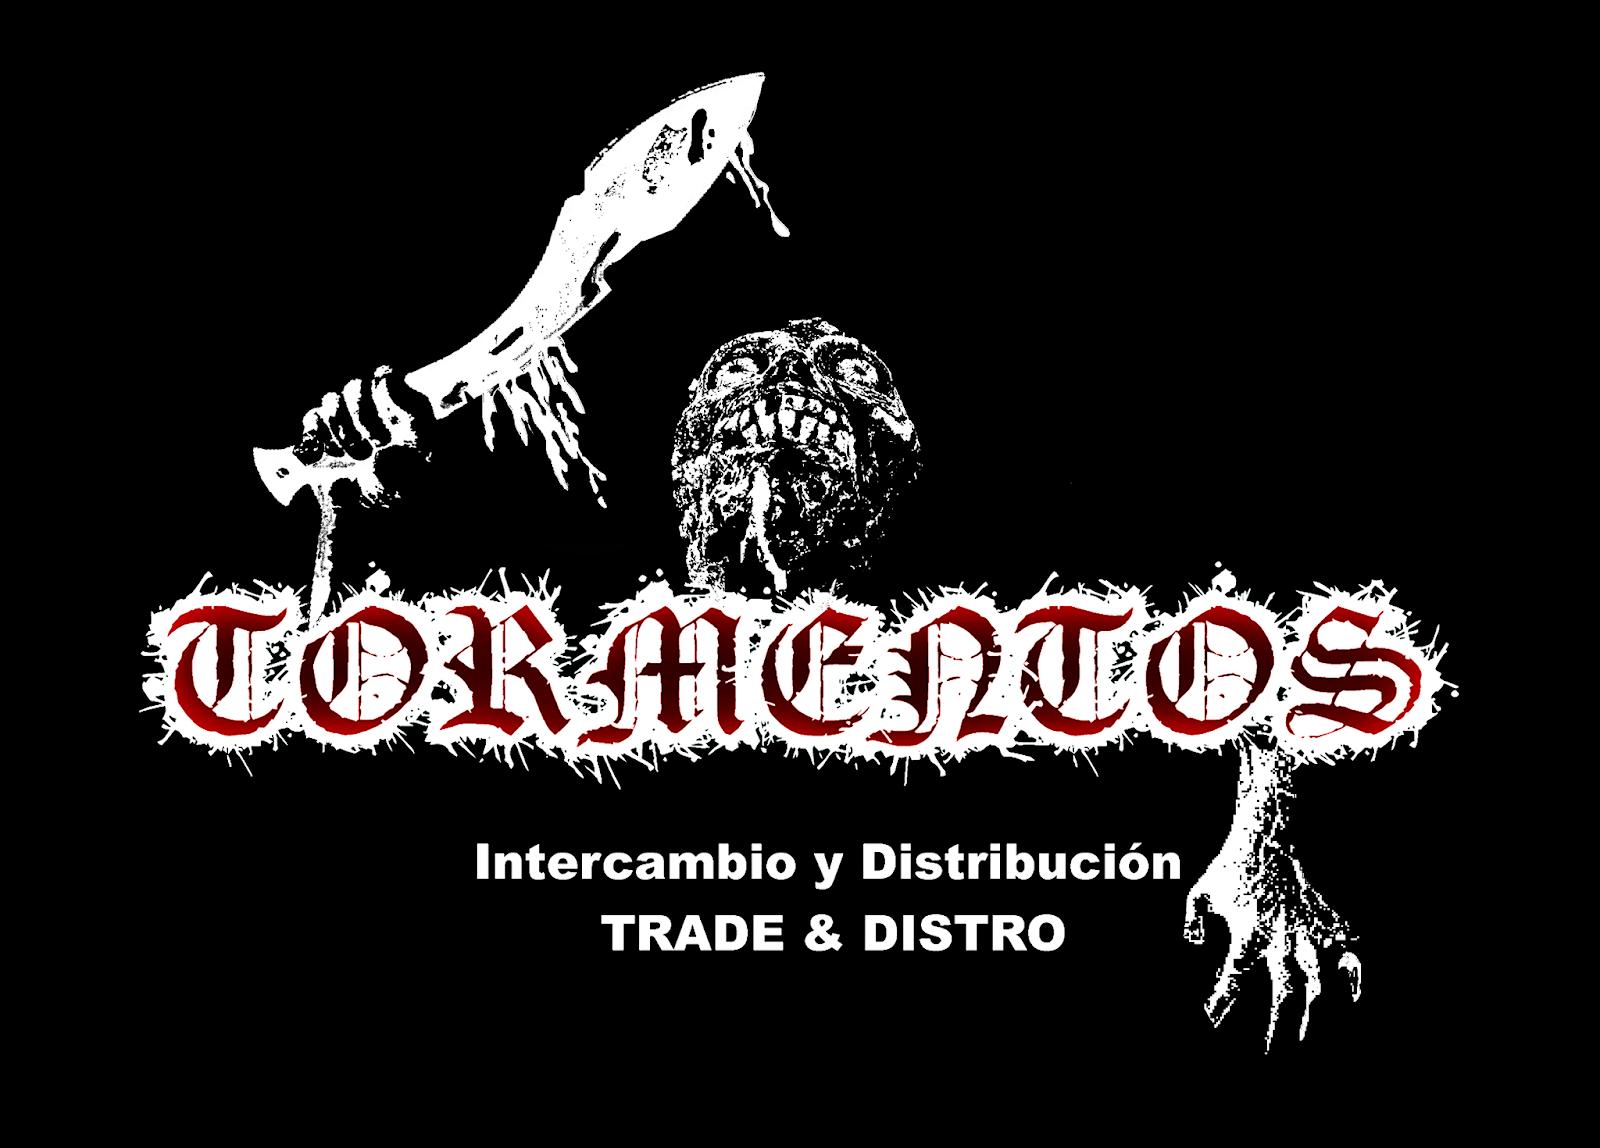 Tormentos Trade / Distro